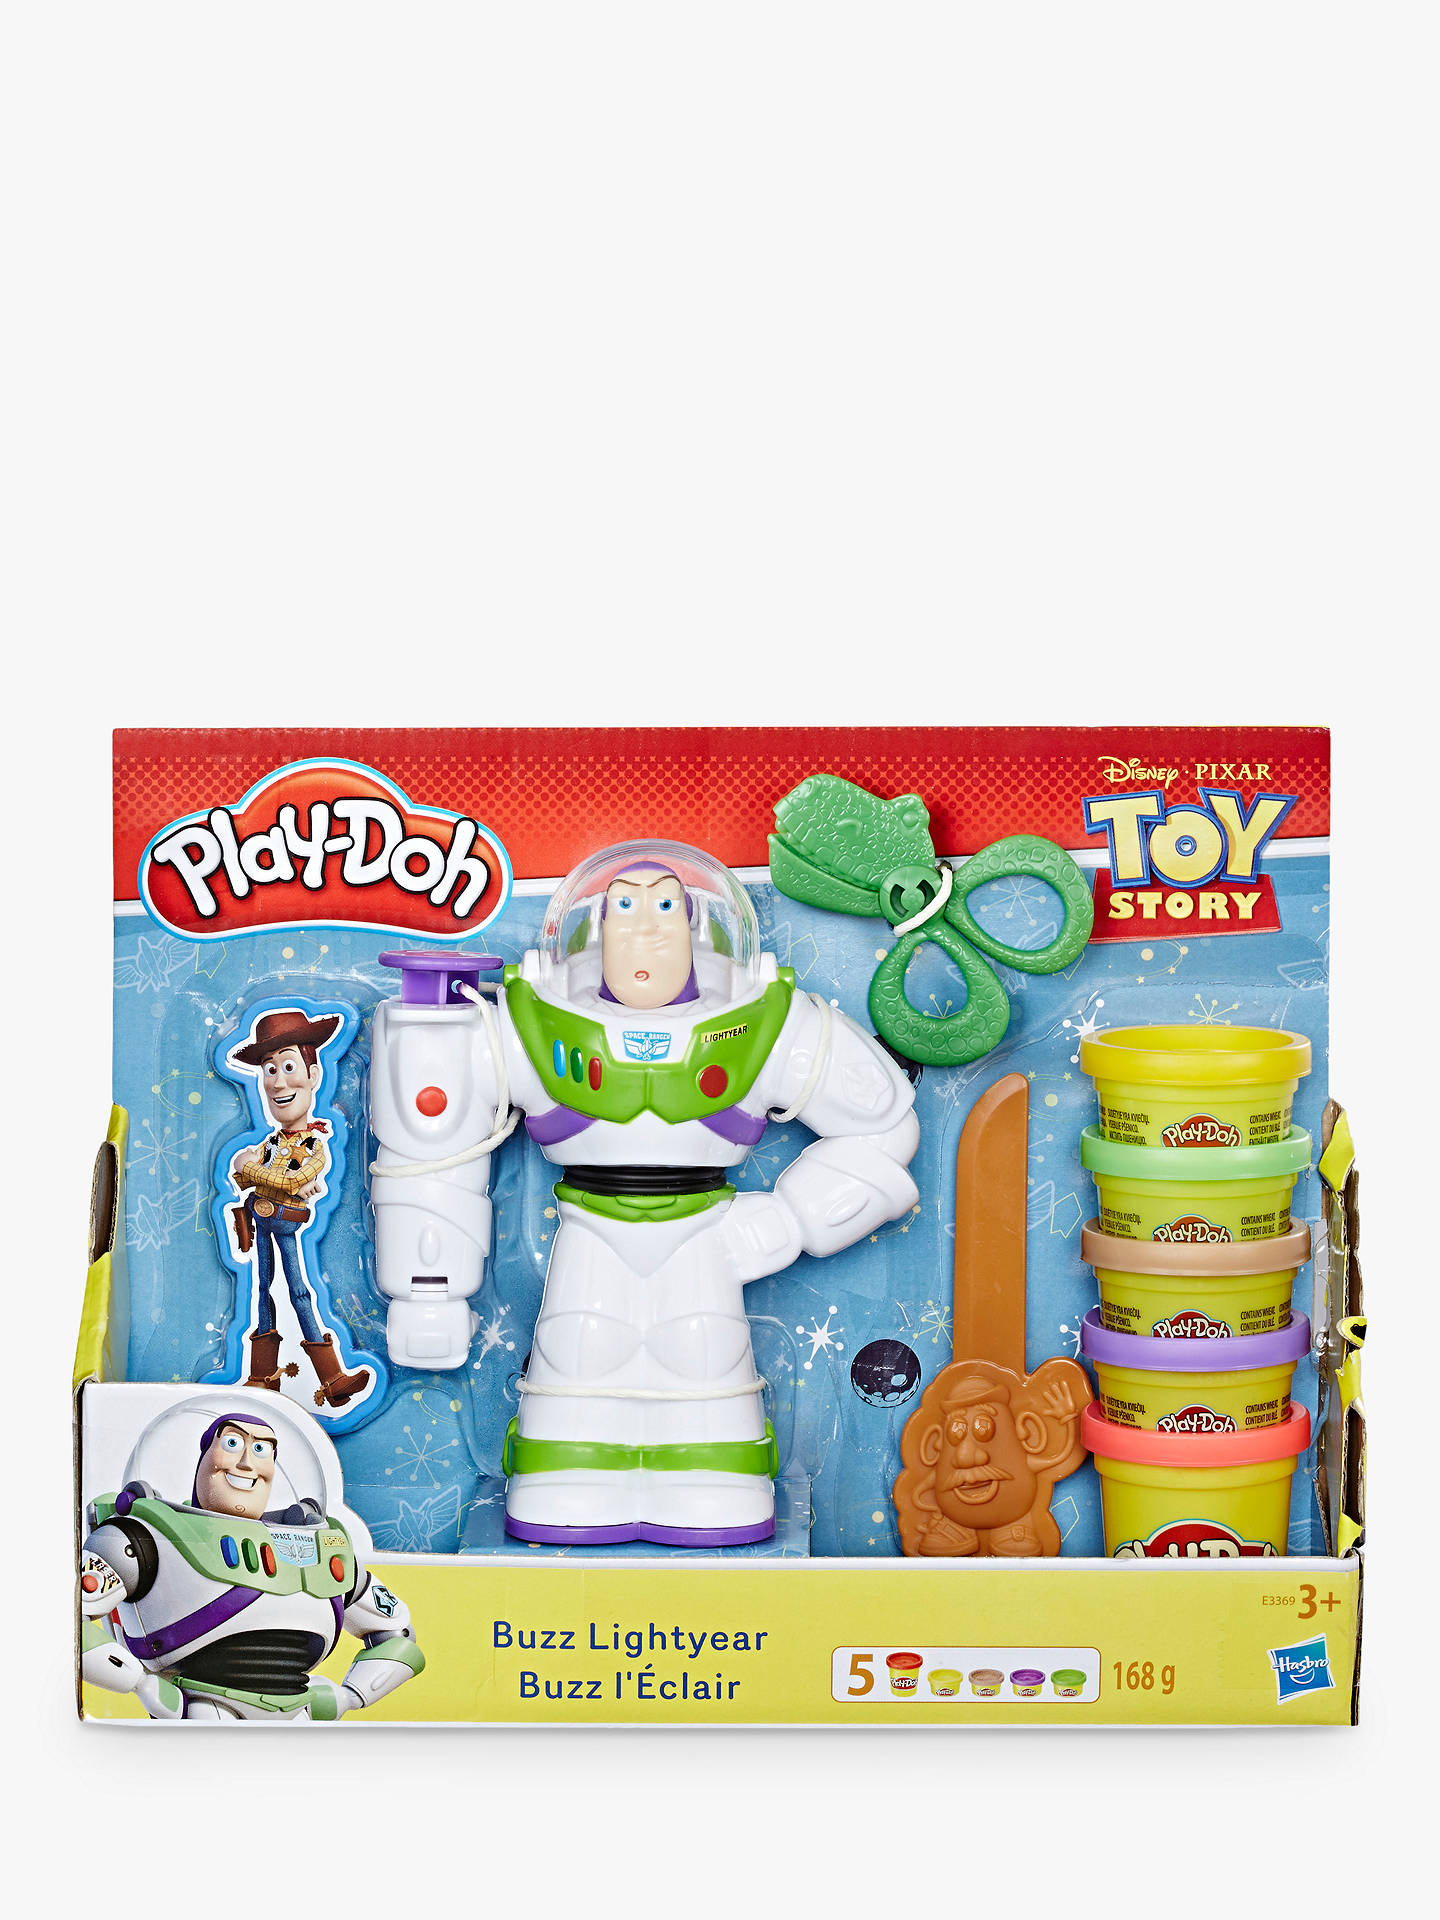 Play-Doh Toy Story Buzz Lightyear